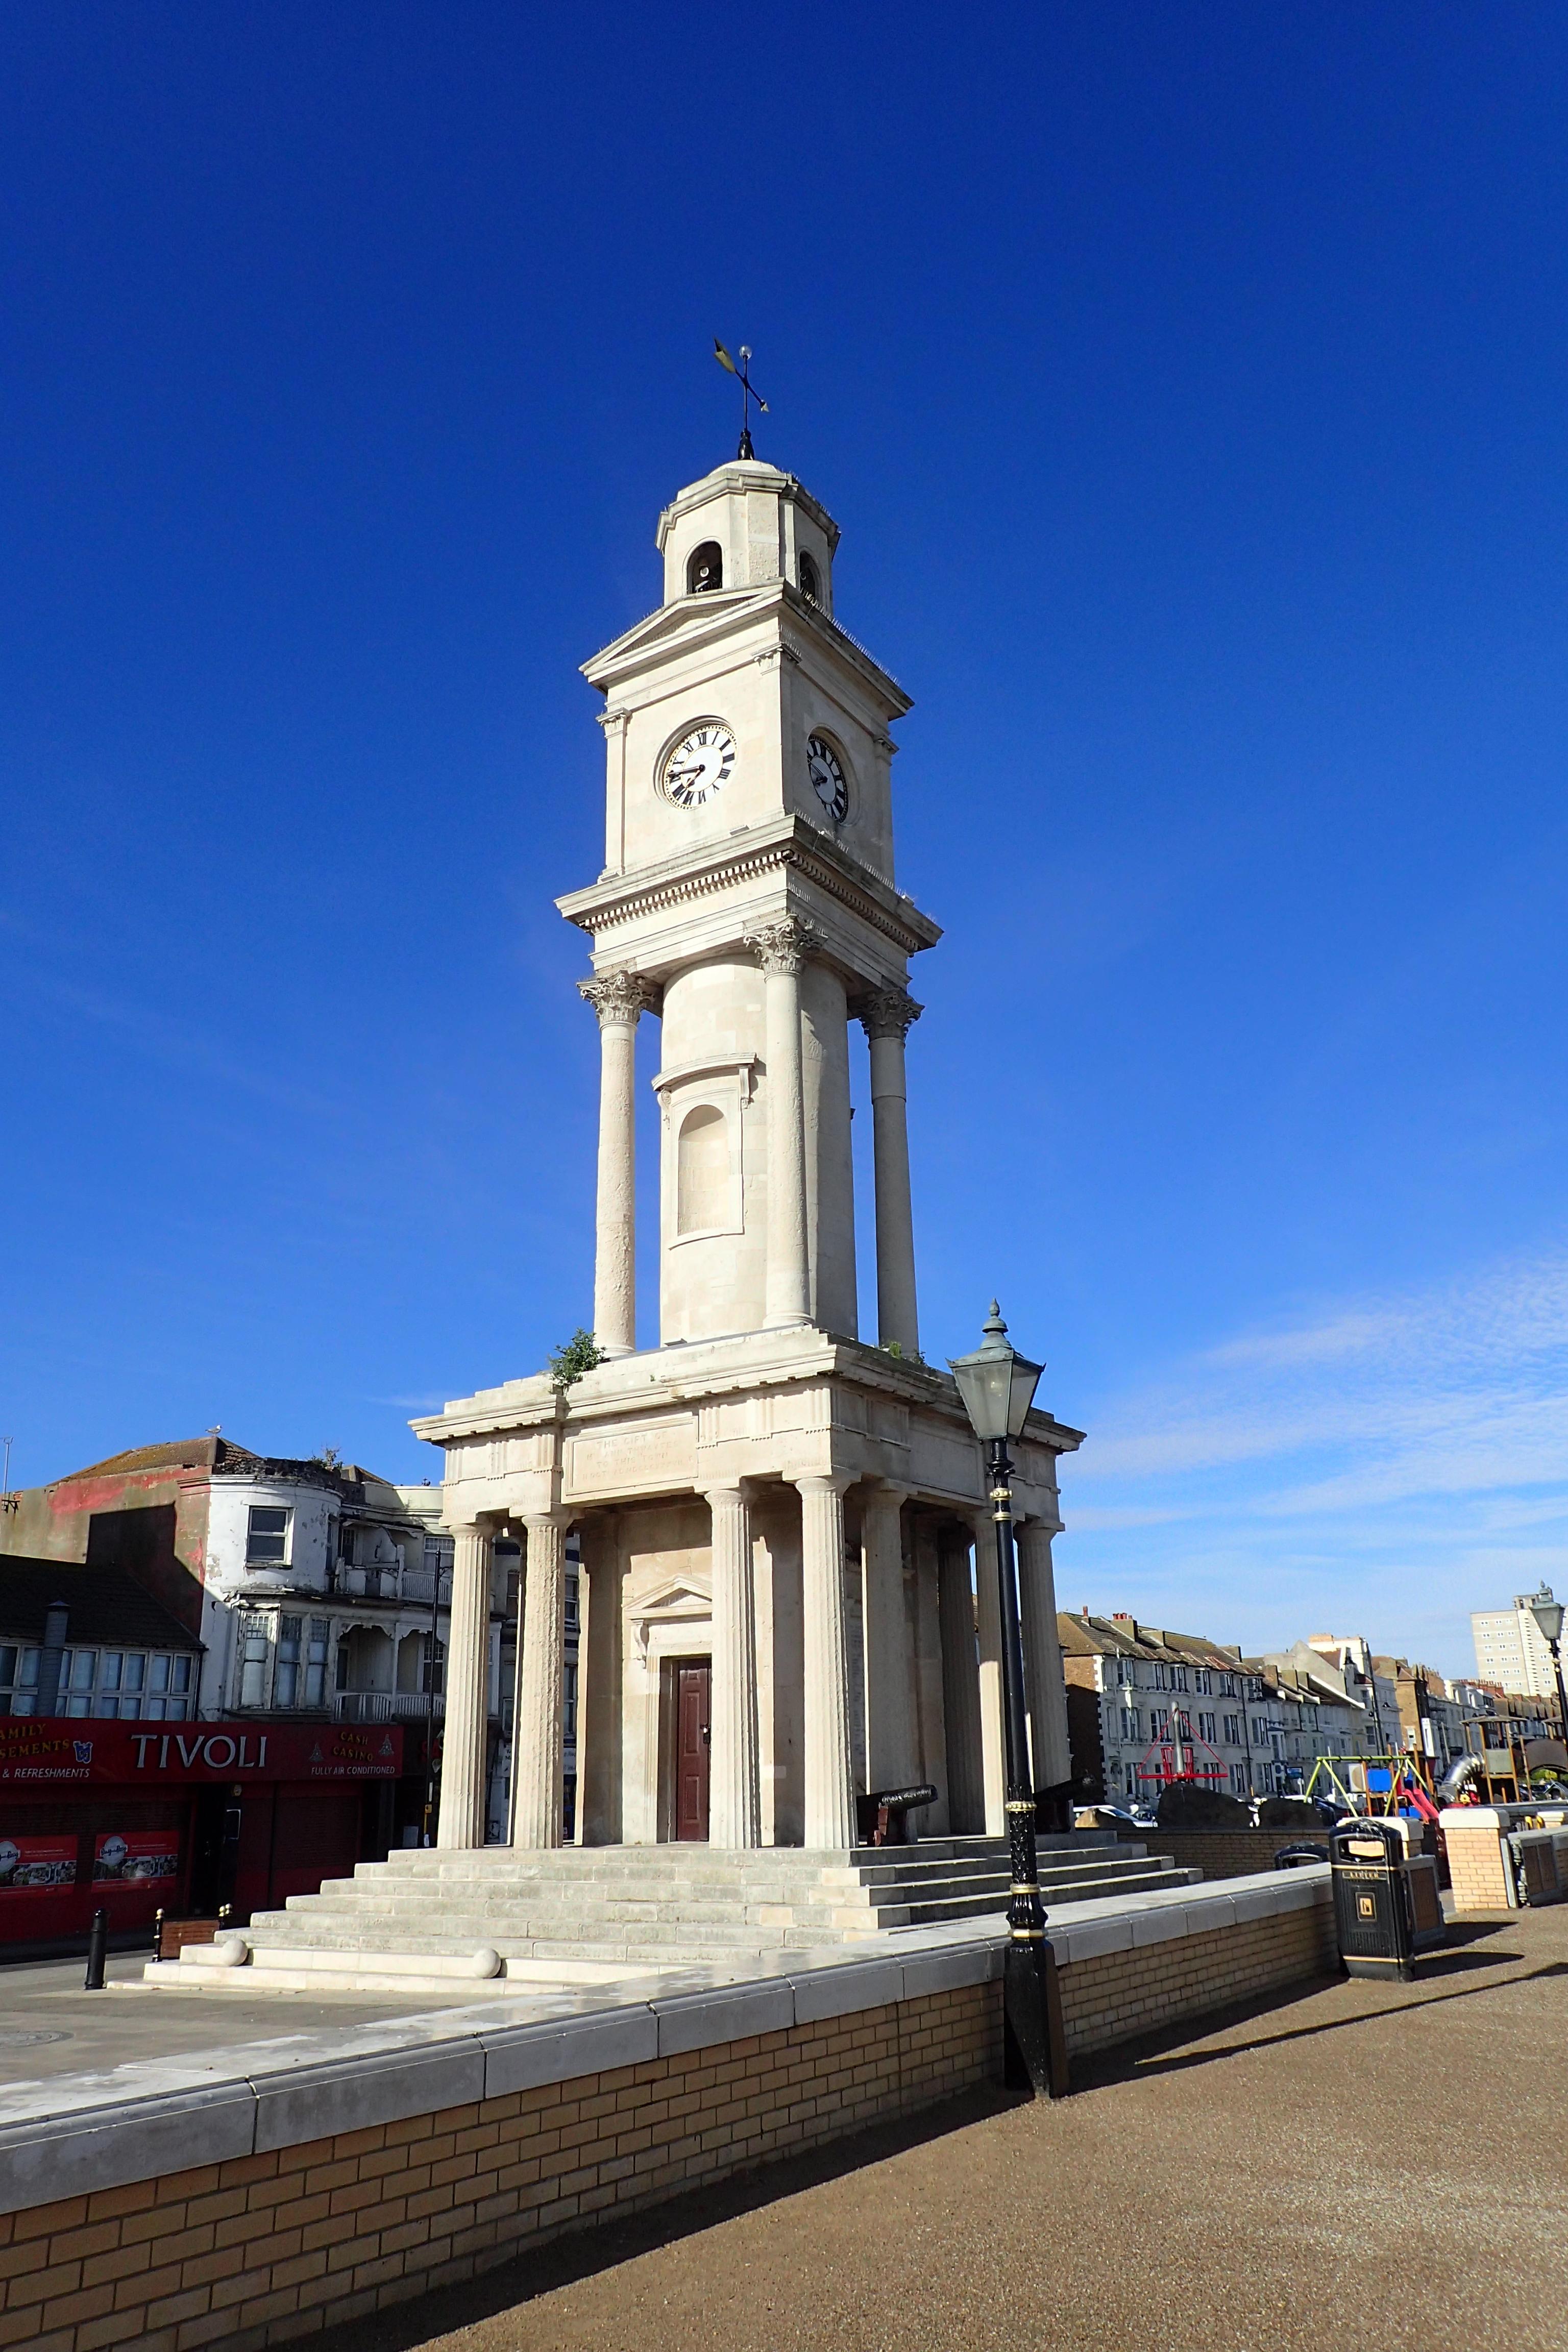 Clock Tower in Herne Bay